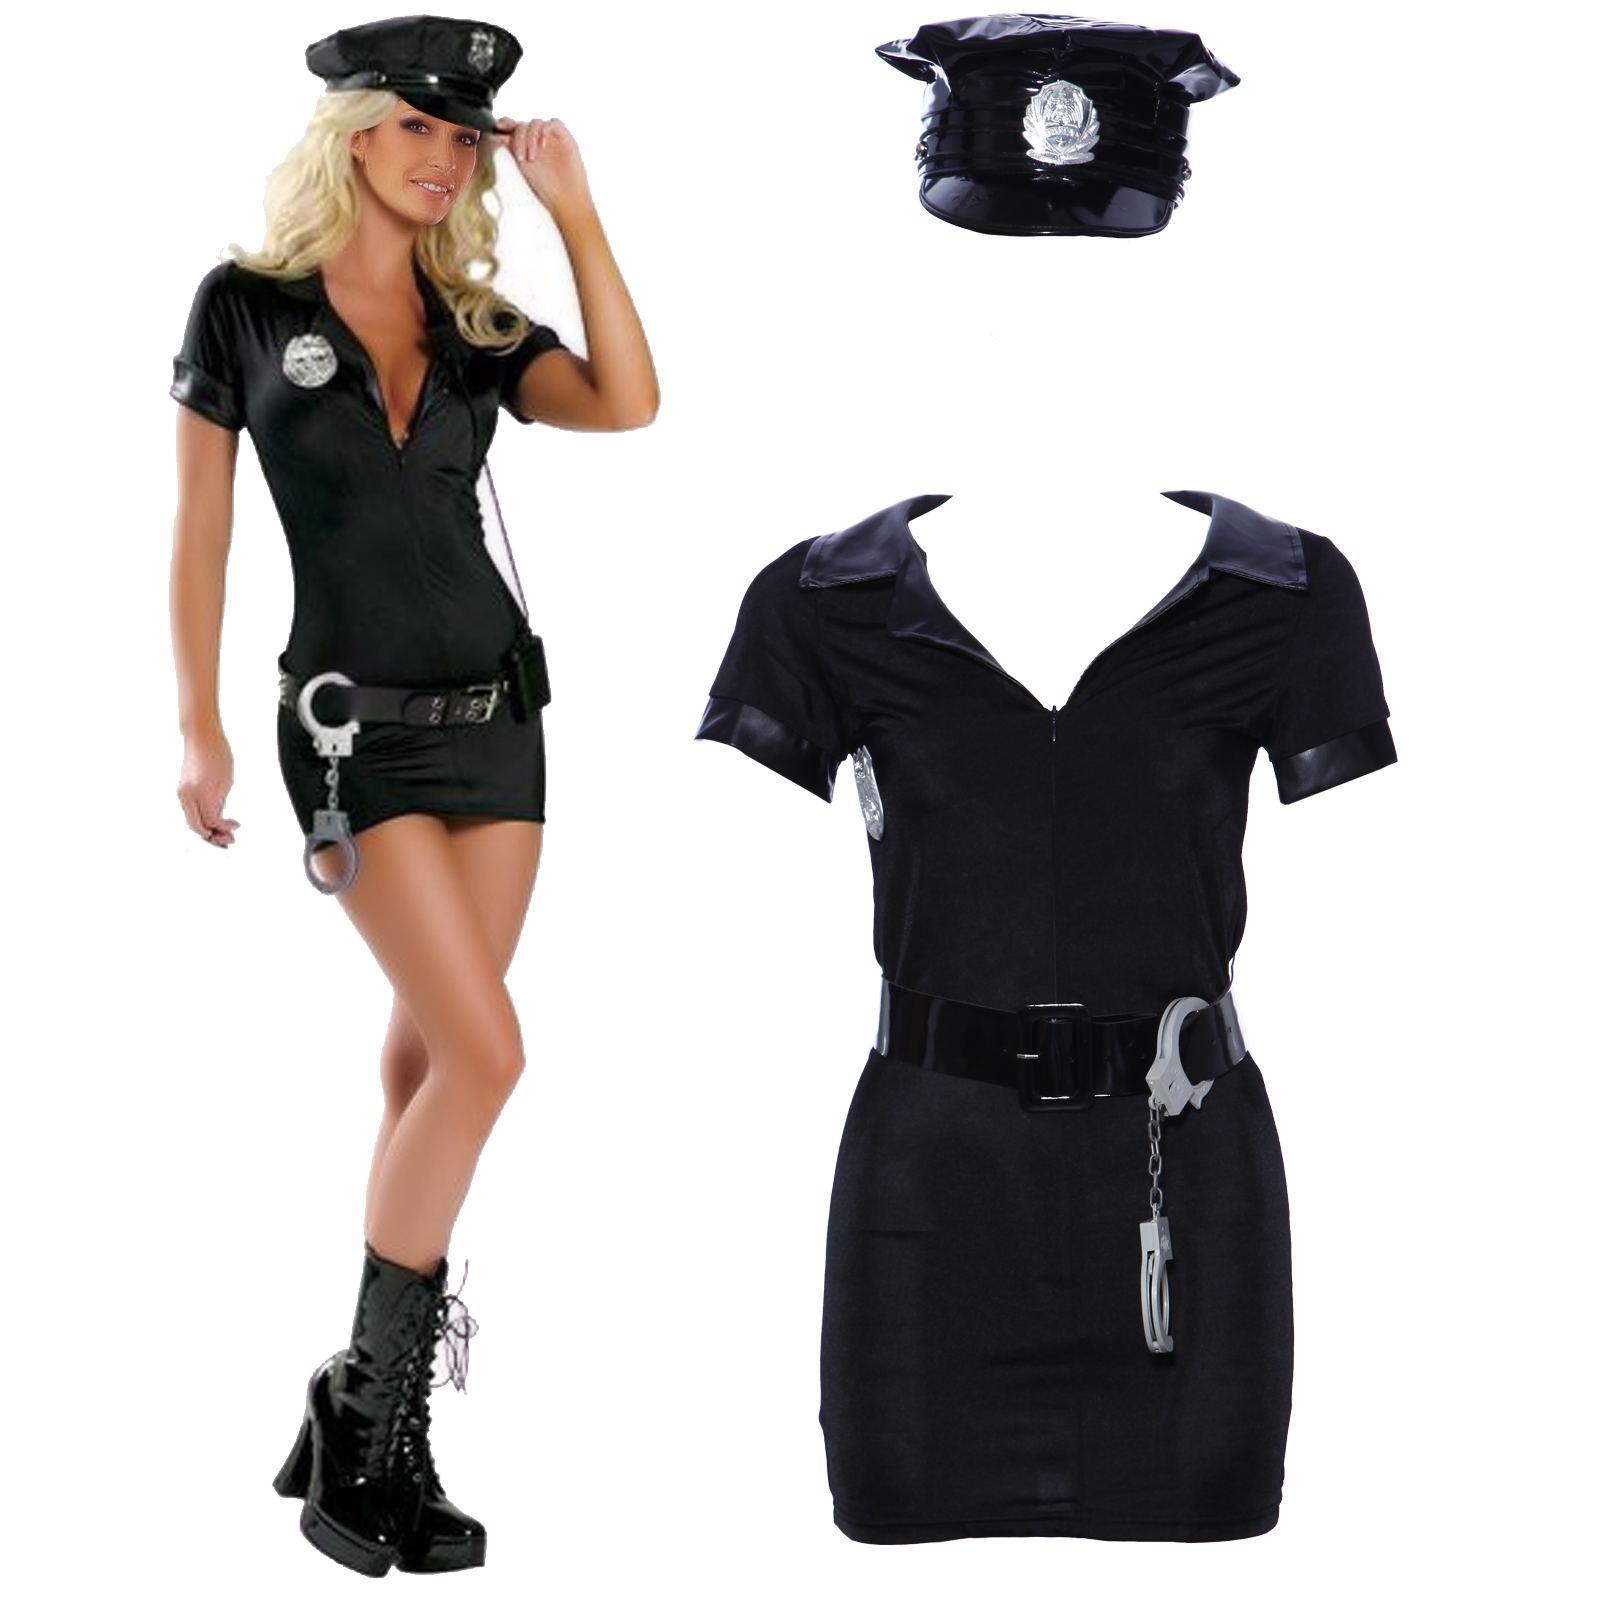 70e5024bae3 Sexy Police Women Ladies Officer Cop Costume Uniform Fancy .